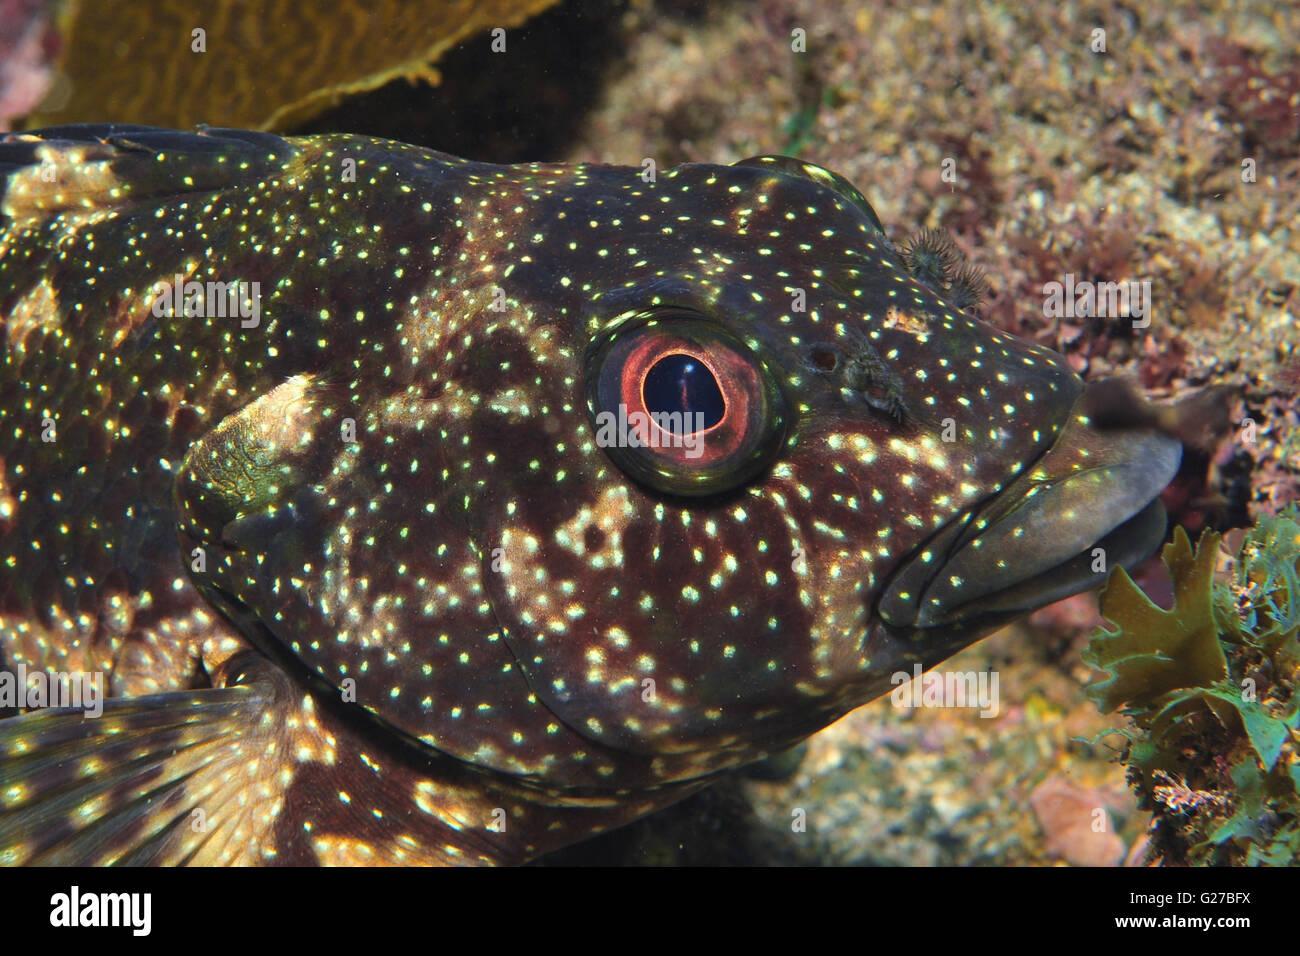 Kelpfish Chironemus marmoratus Stock Photo